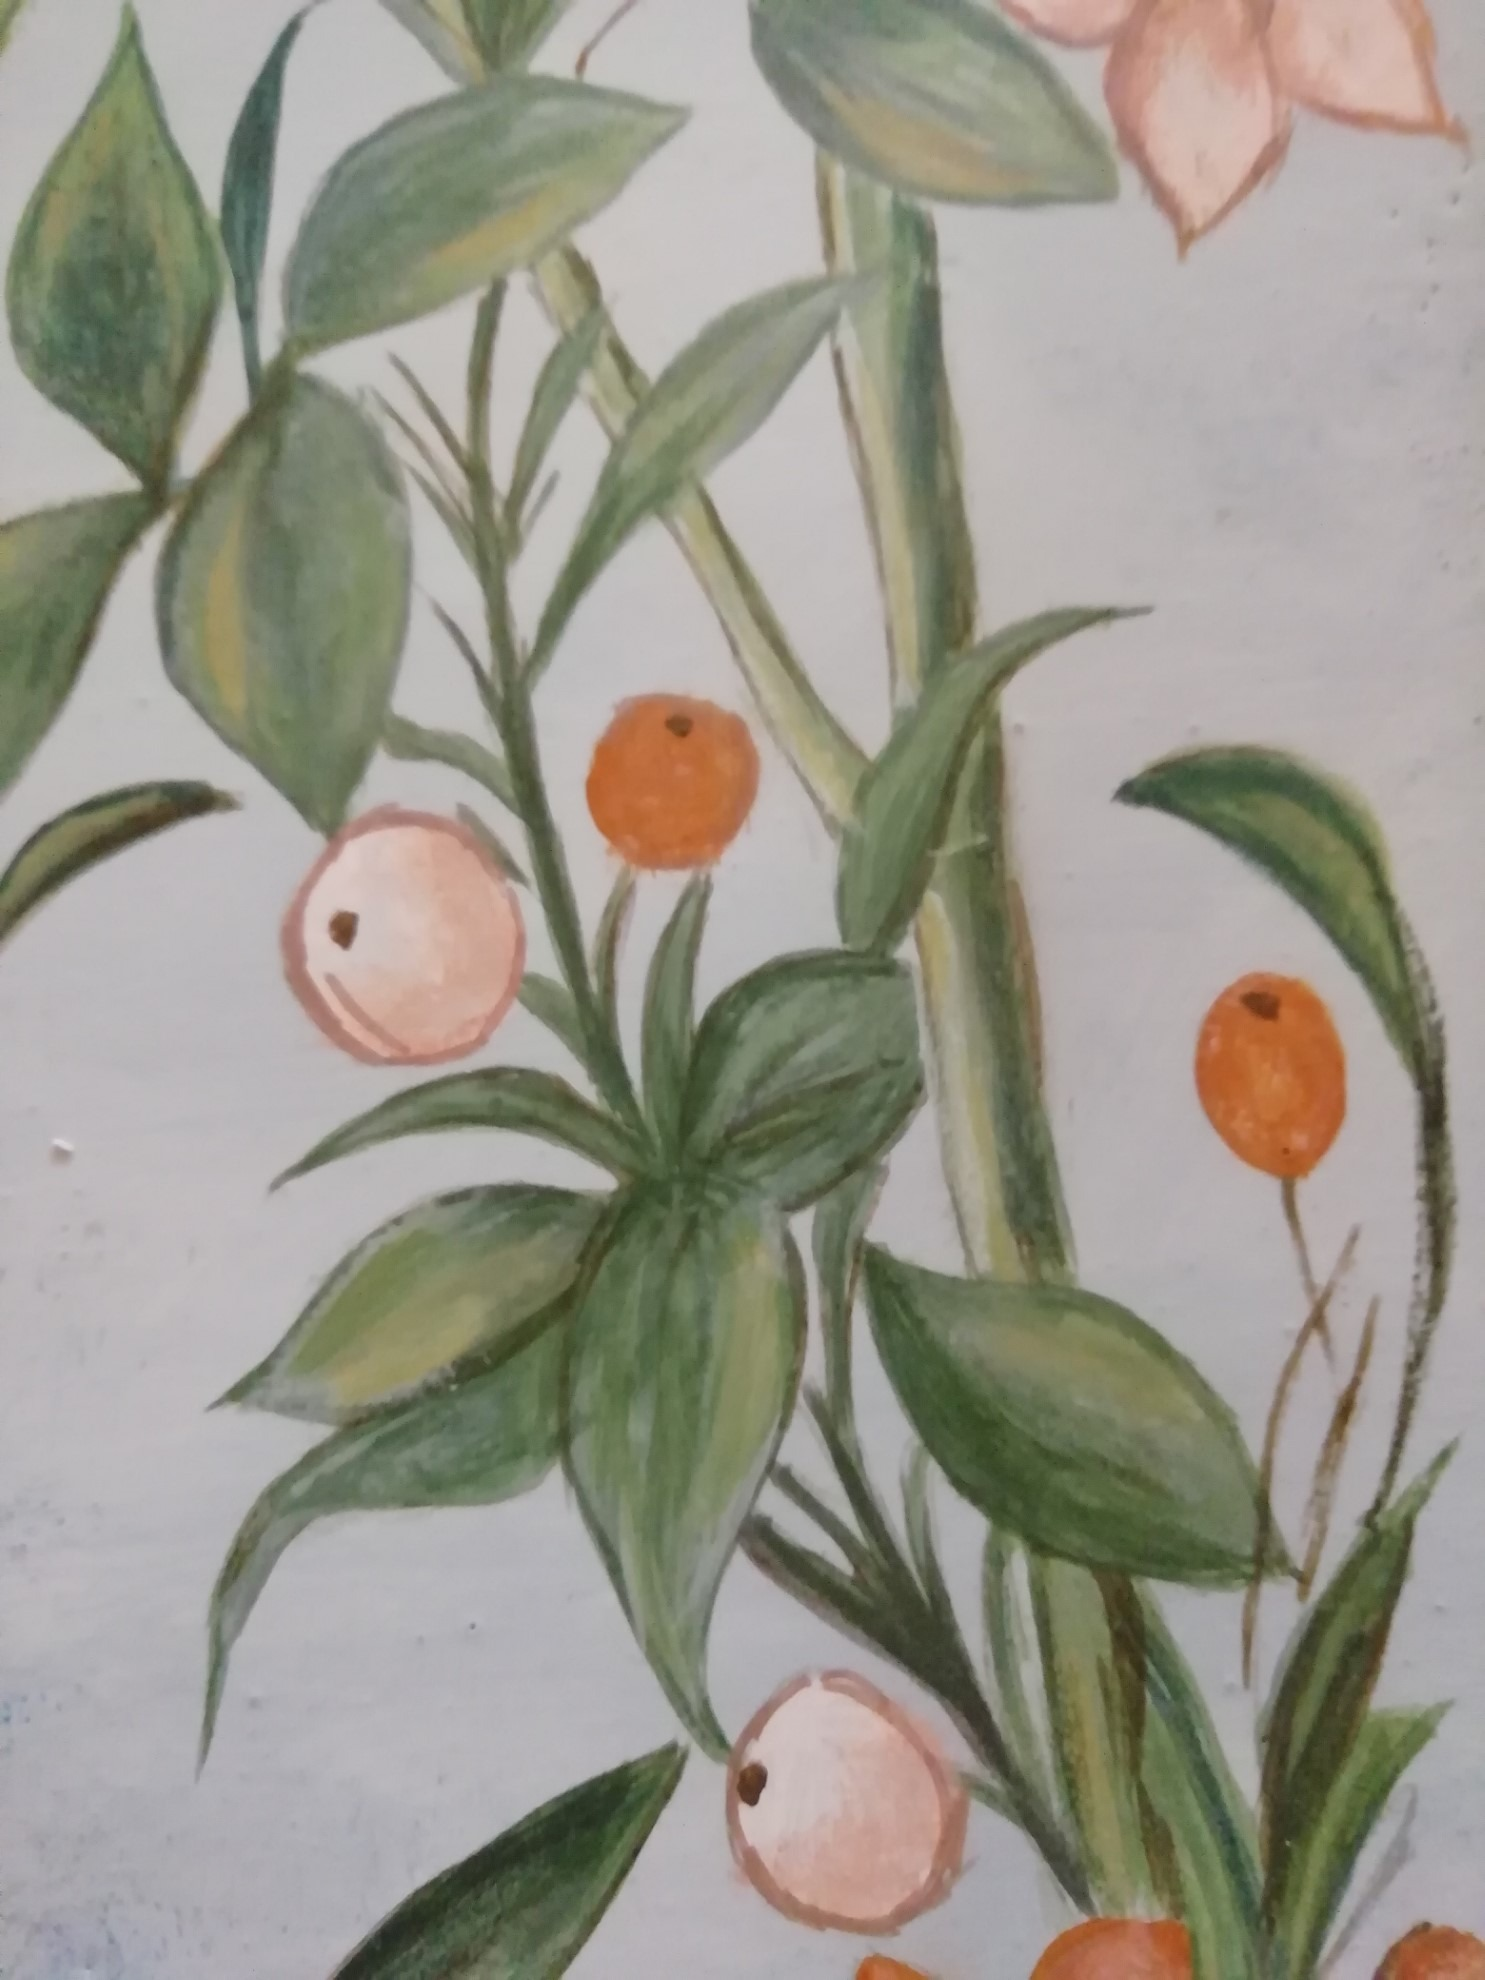 L'Atelier d'Apolline, Peintre décoratrice - Tempera